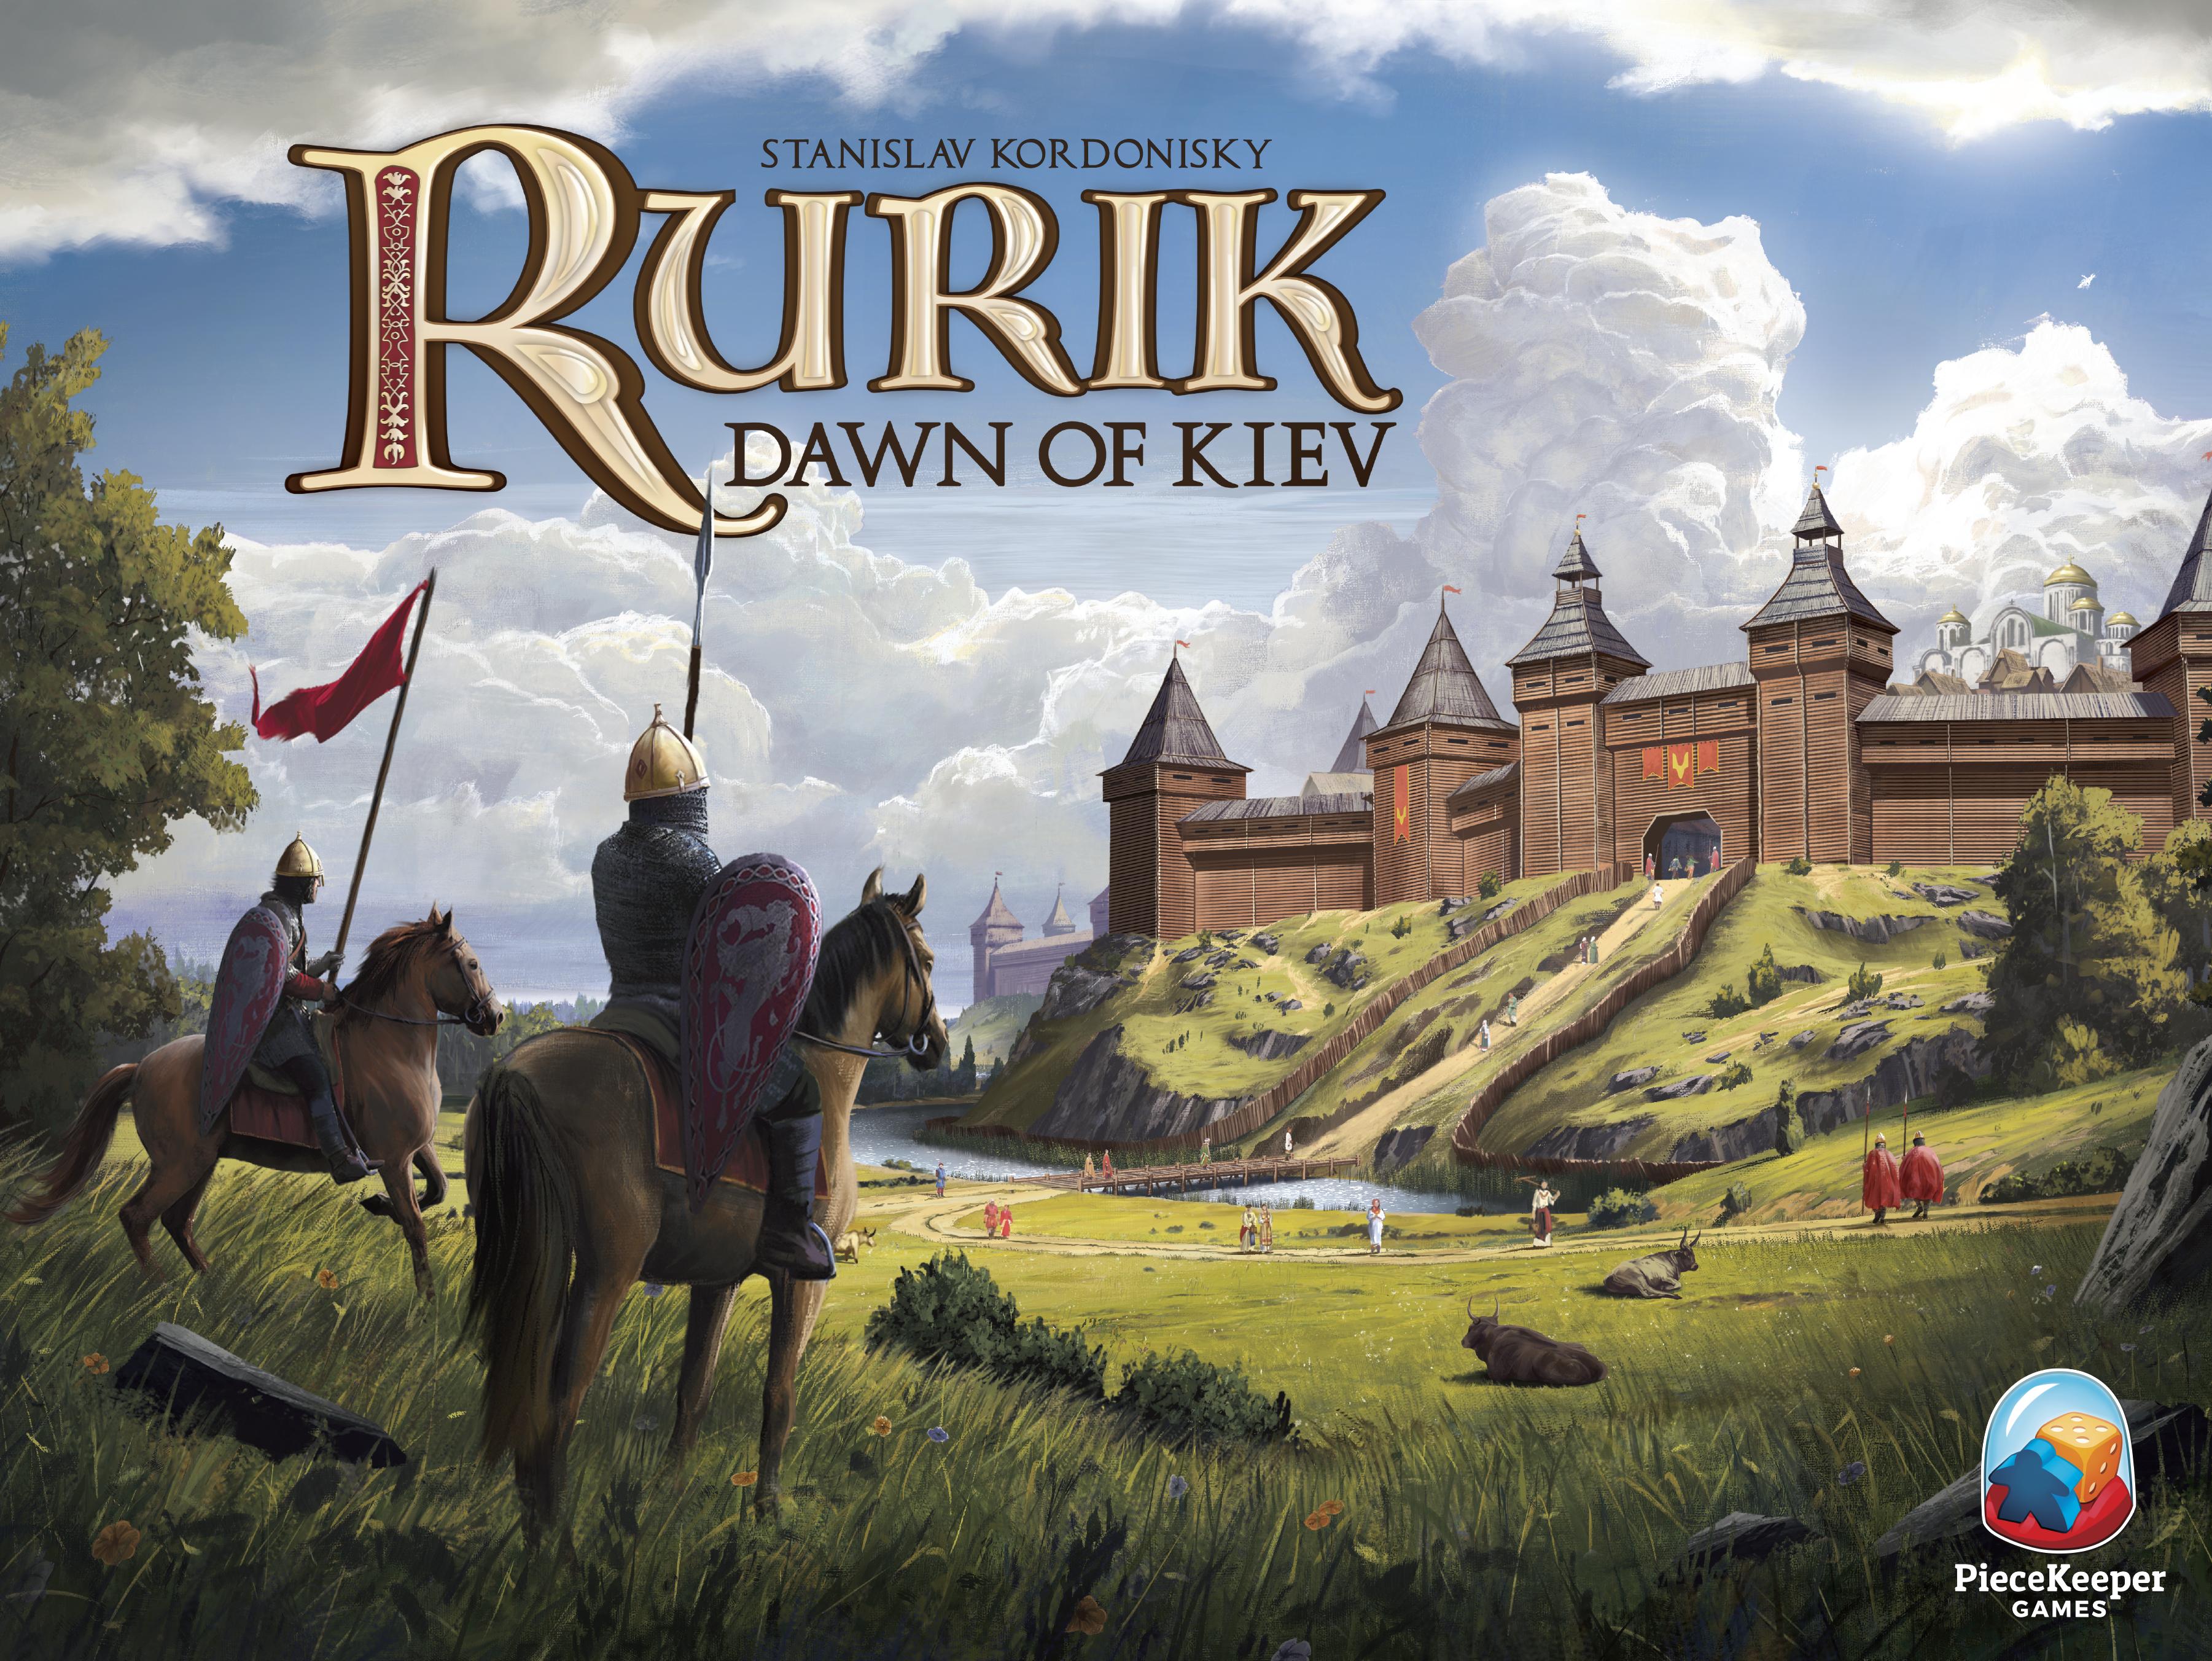 Rurik: Dawn of Kiev